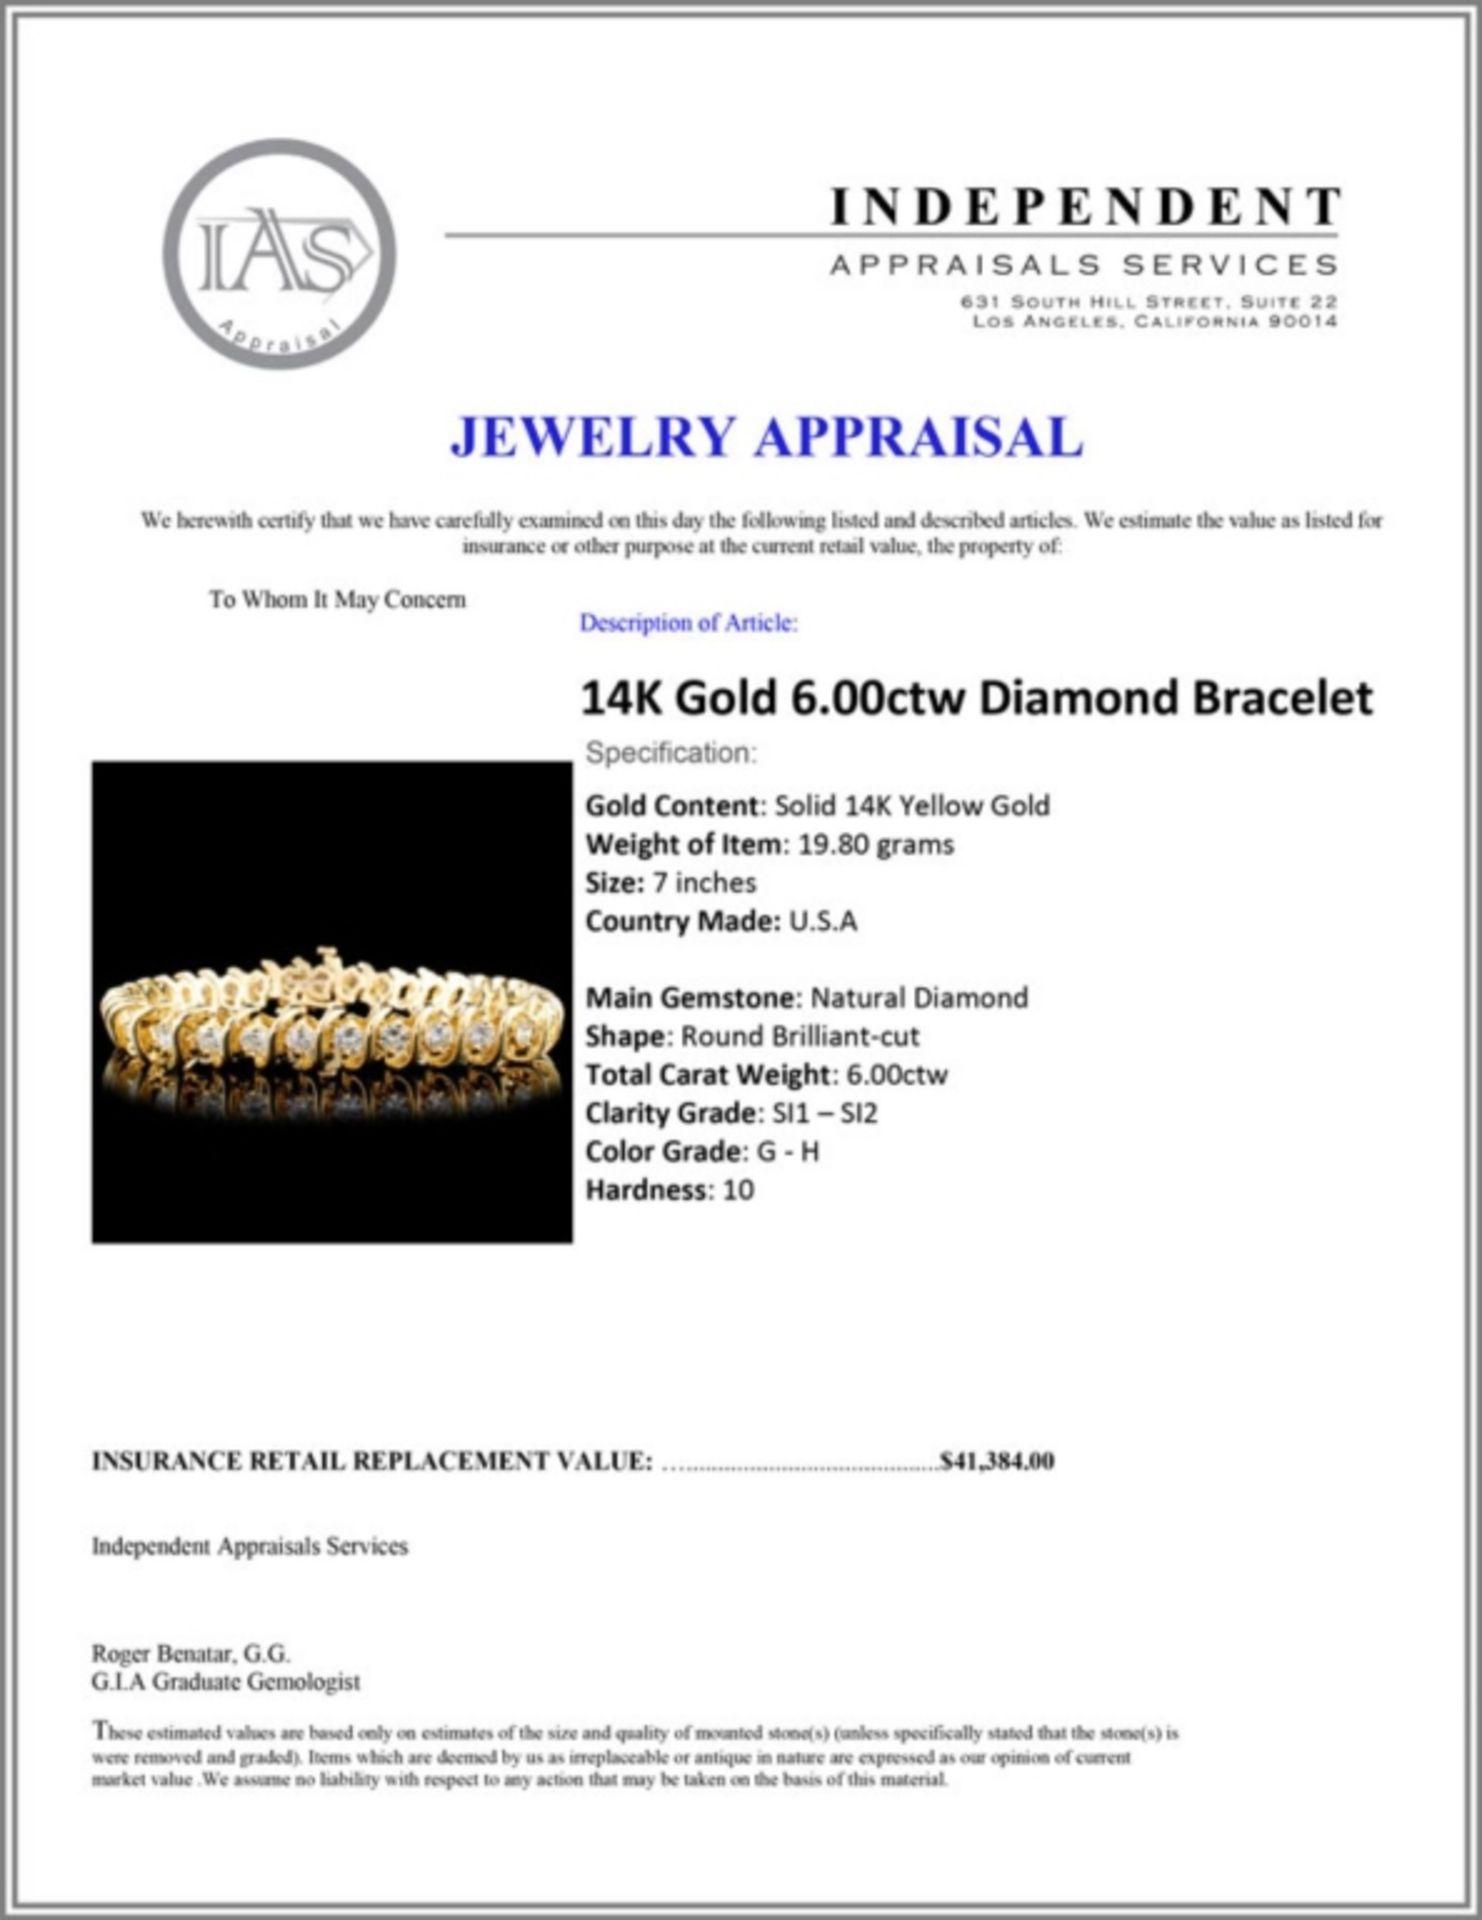 14K Gold 6.00ctw Diamond Bracelet - Image 4 of 4